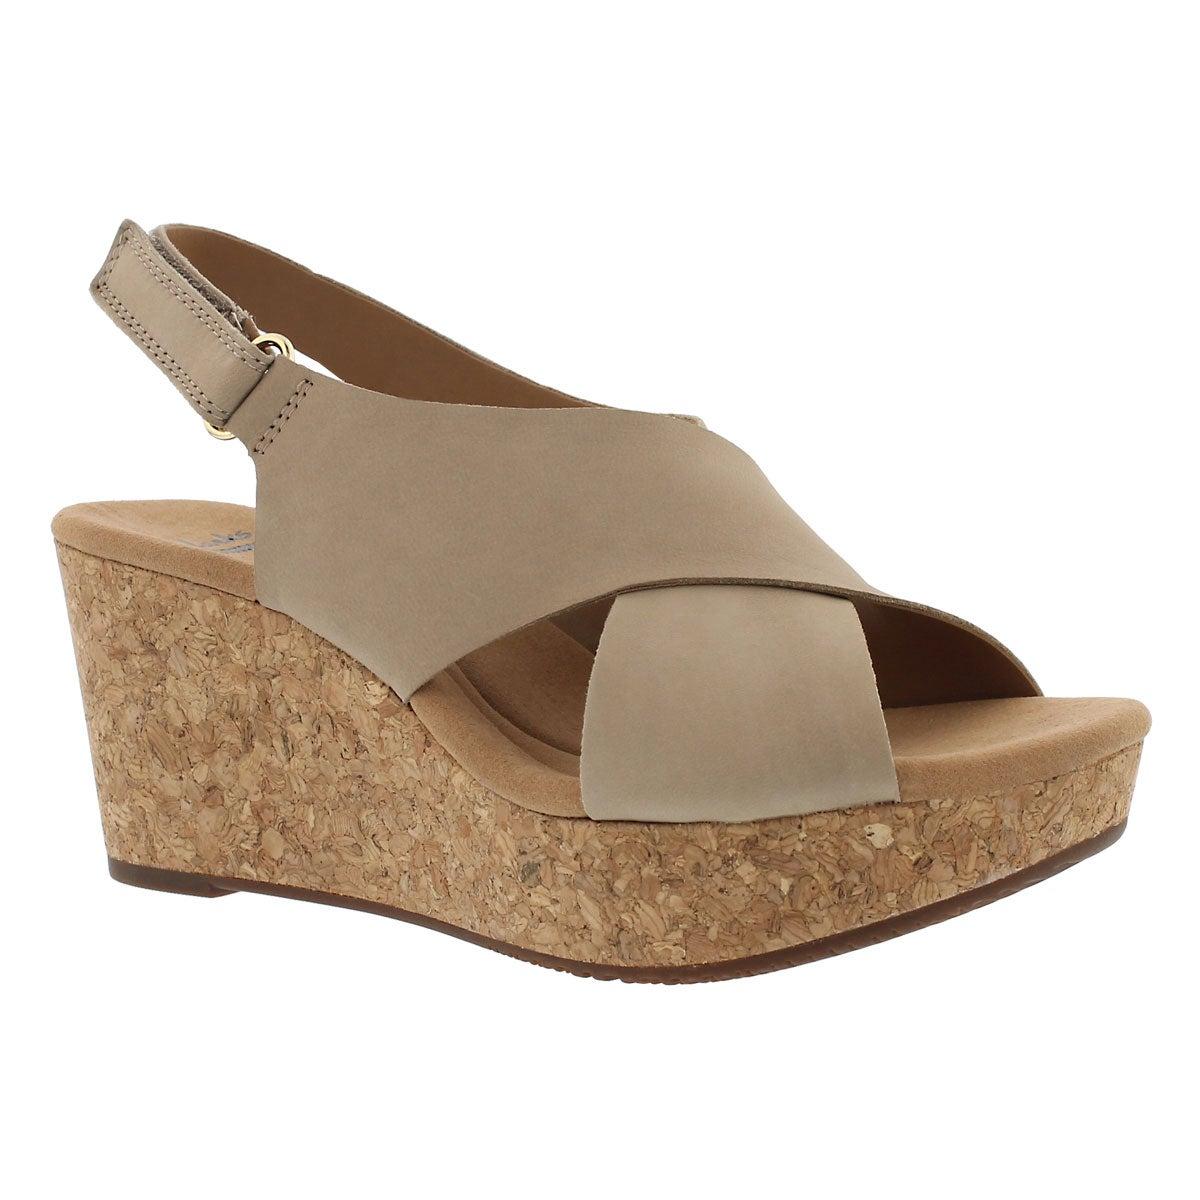 Women's ANNADEL EIRWYN sand wedge sandals